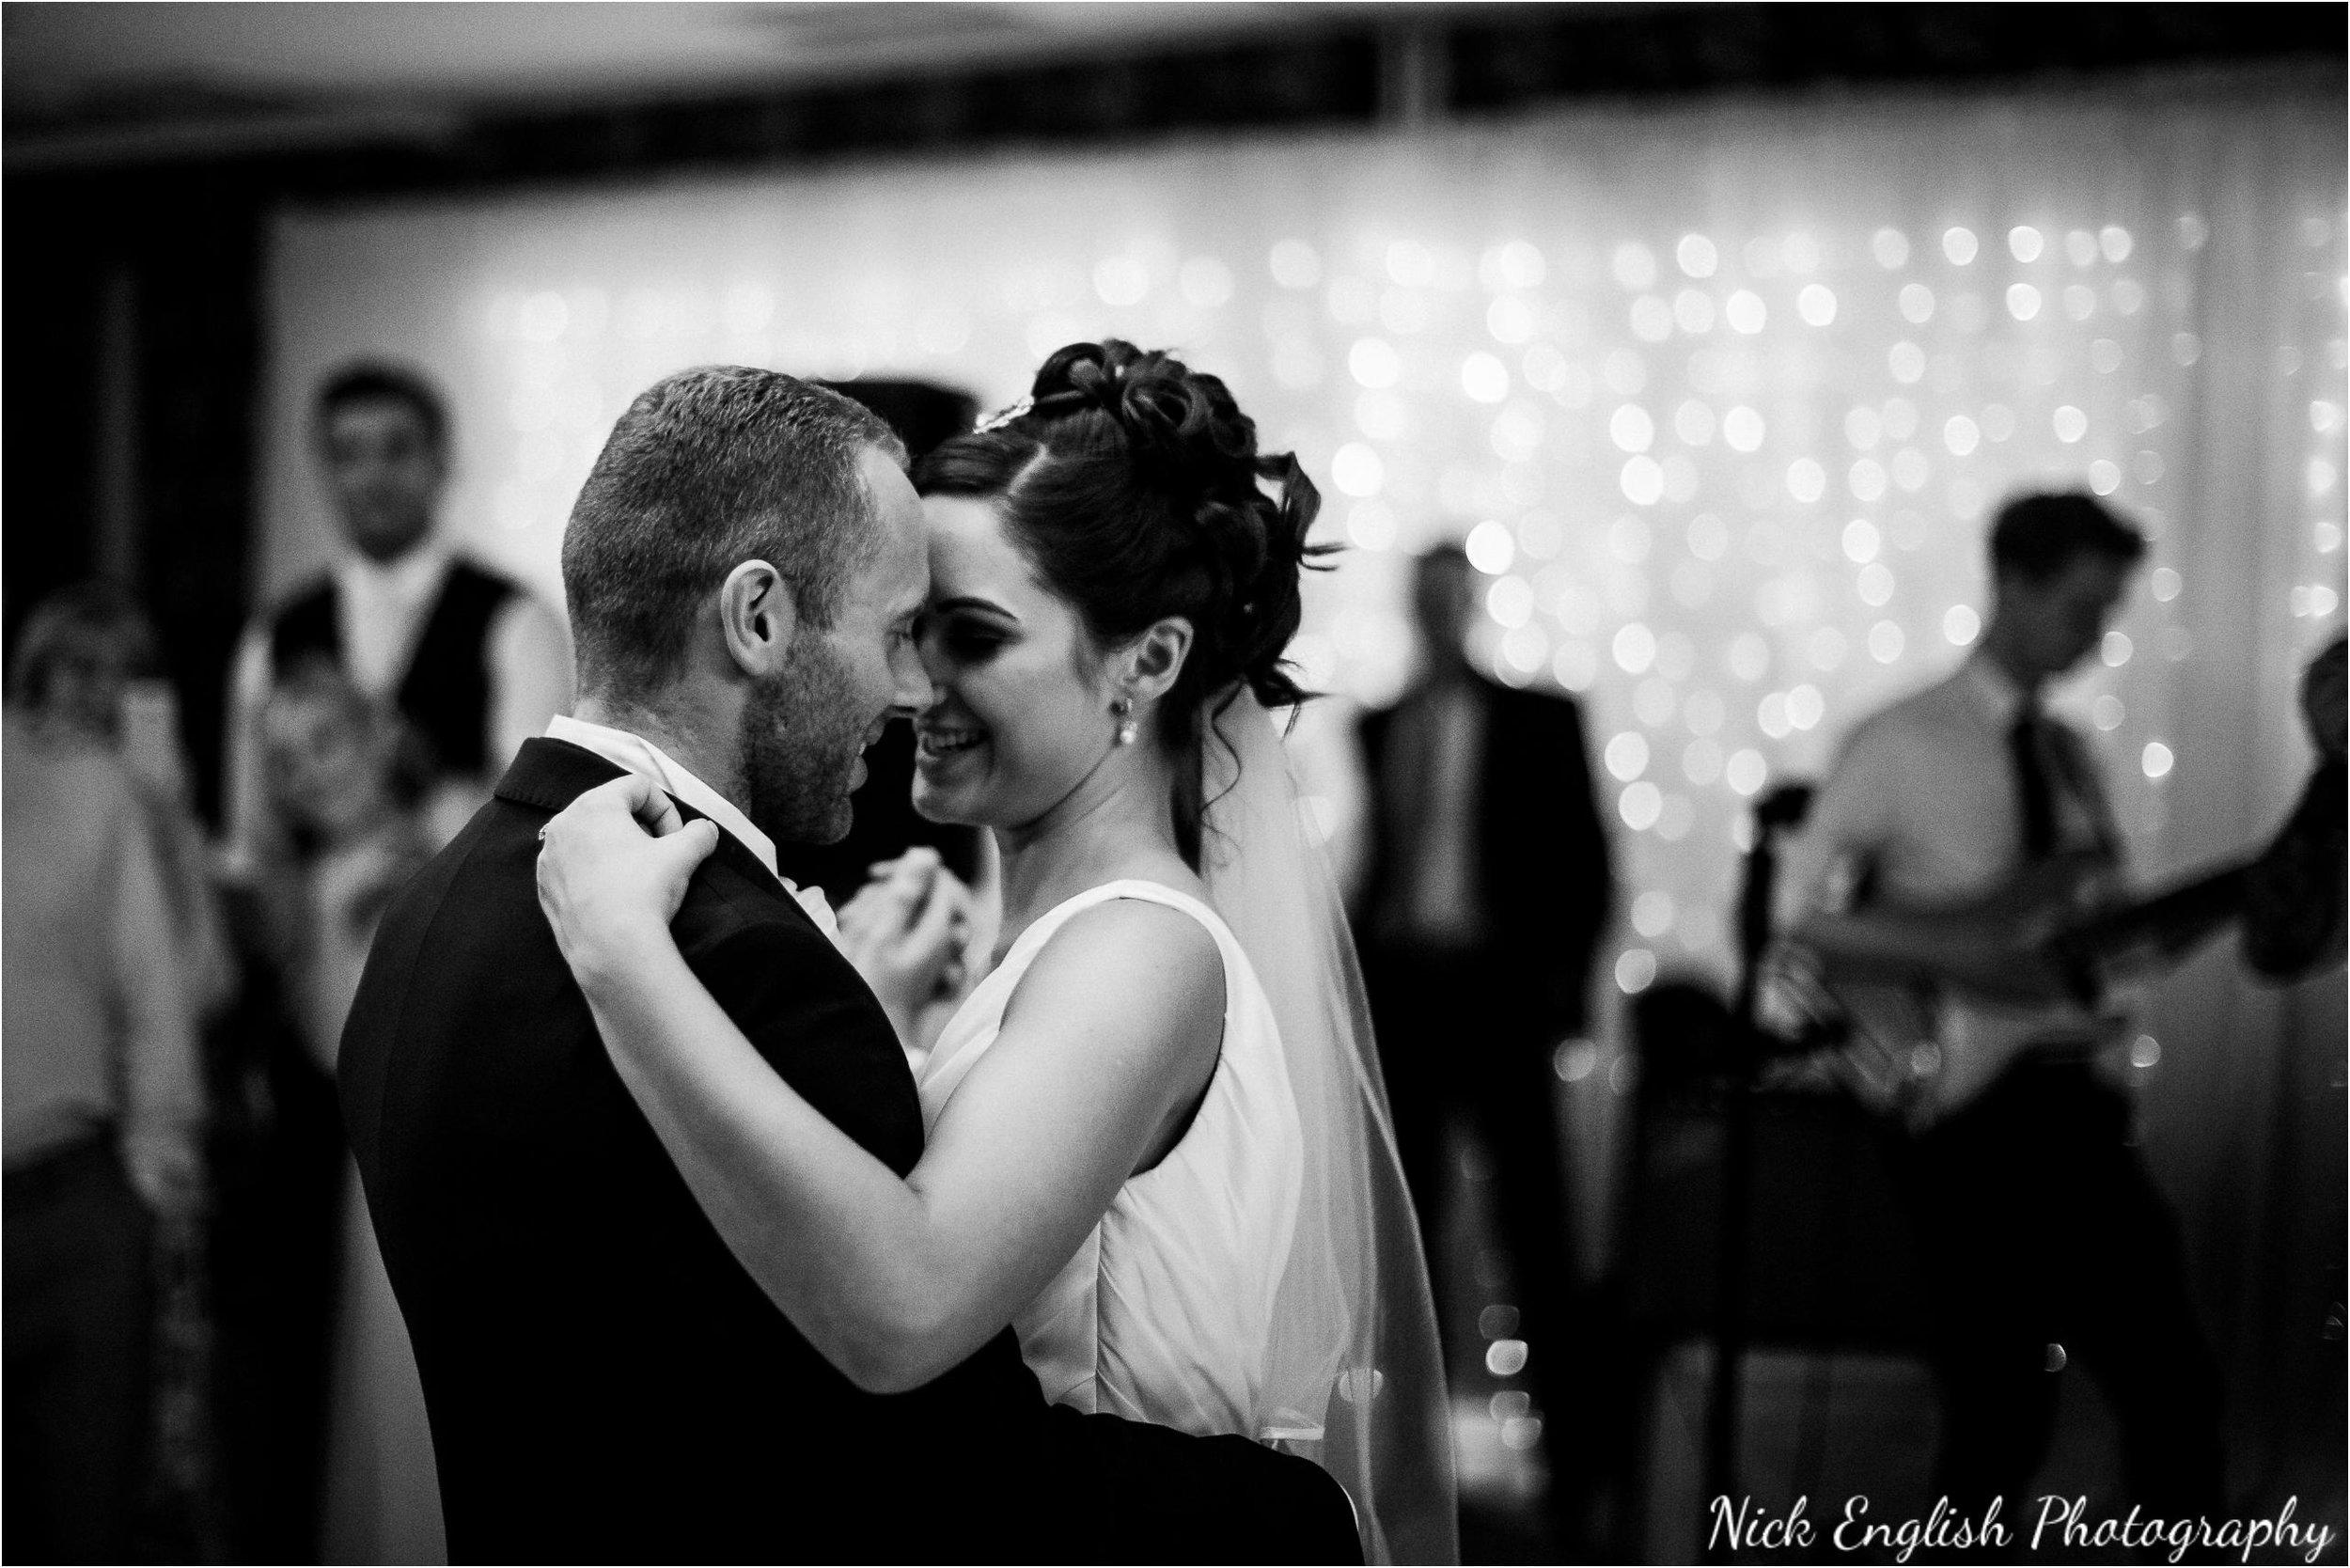 Emily David Wedding Photographs at Barton Grange Preston by Nick English Photography 221jpg.jpeg